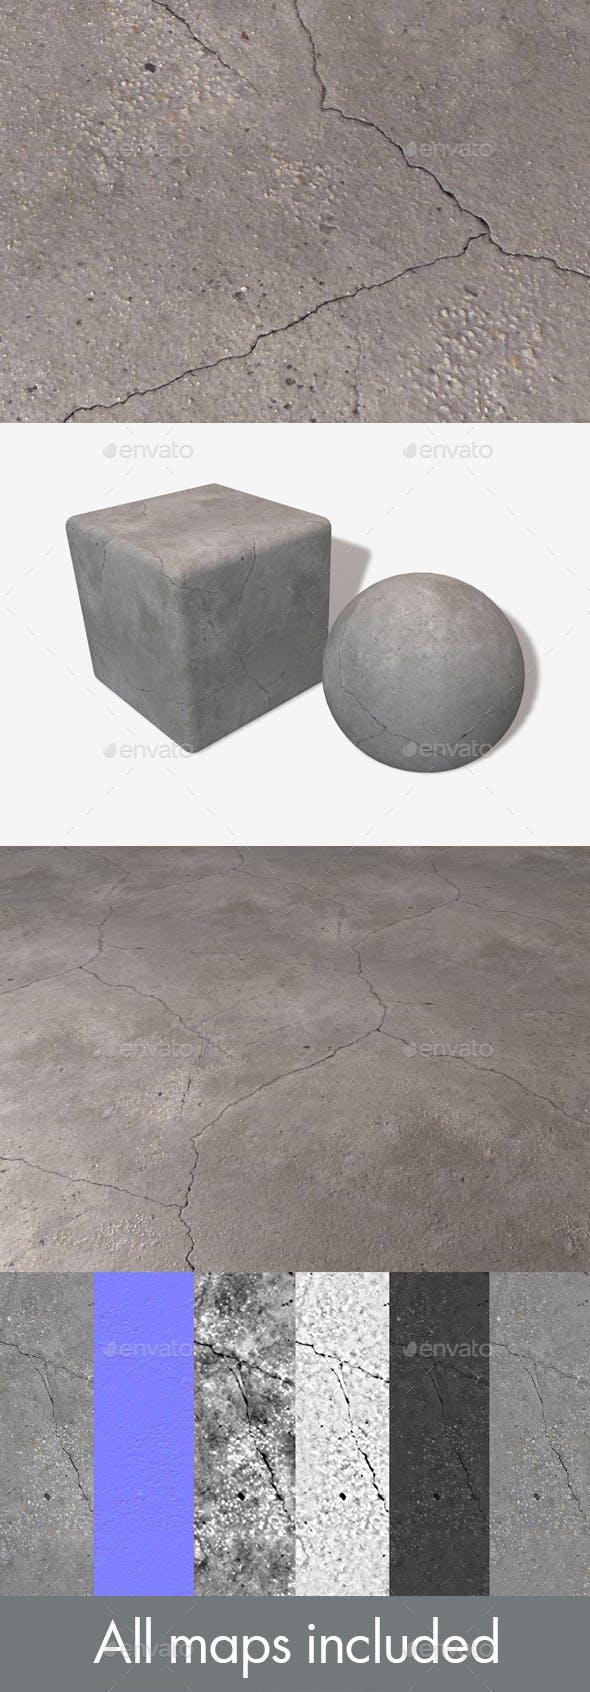 Concrete Cracks Seamless Texture - 3DOcean Item for Sale